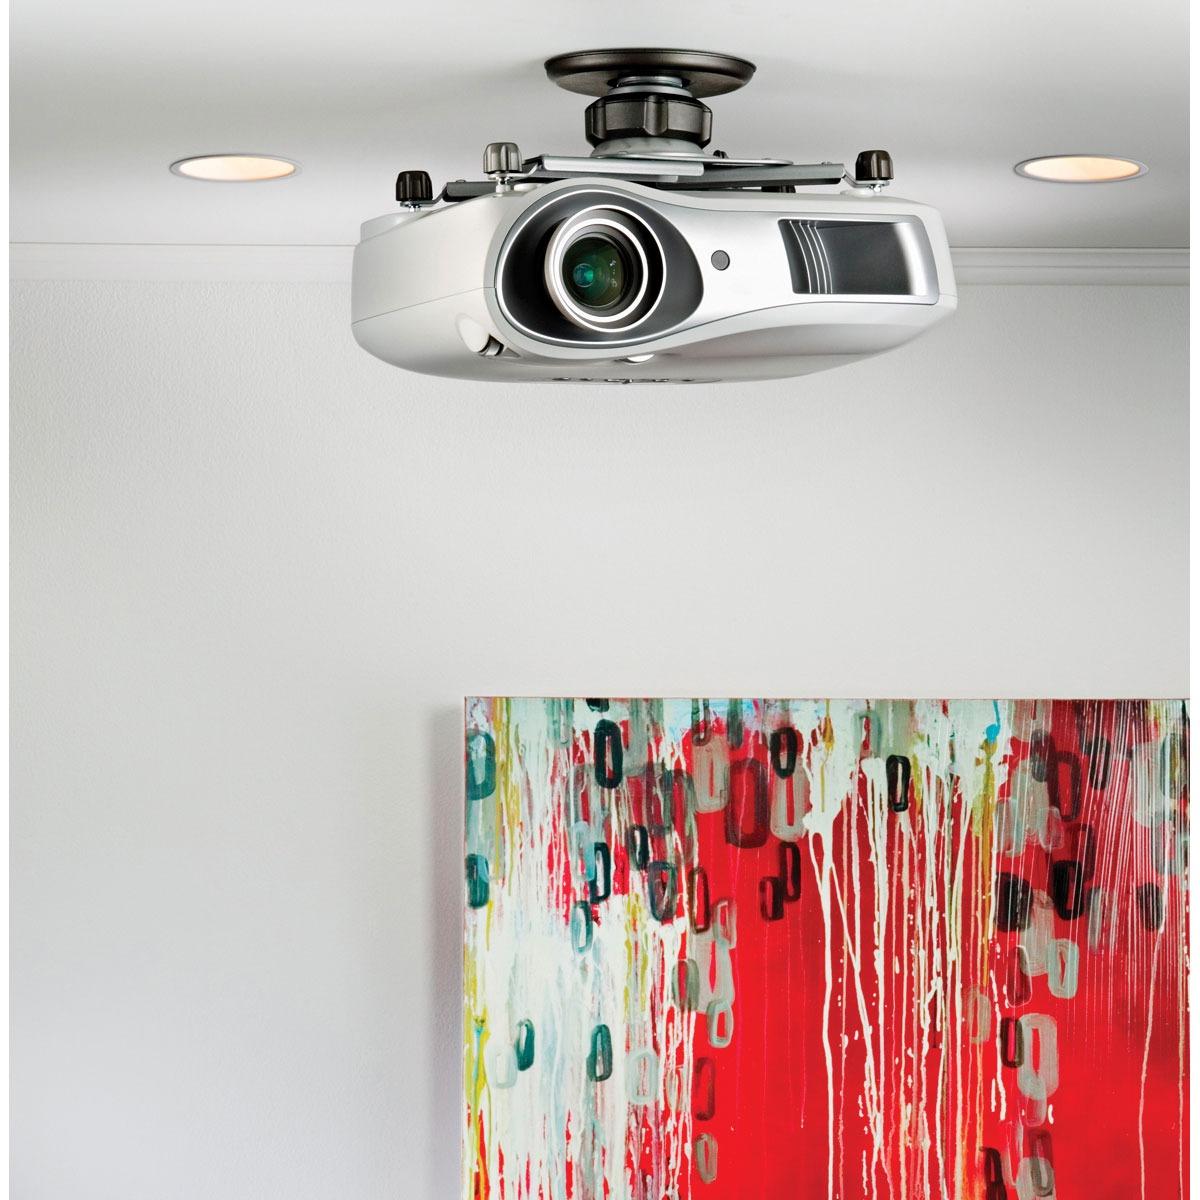 ergotron neo flex 60 623 support plafond vid oprojecteur ergotron sur. Black Bedroom Furniture Sets. Home Design Ideas